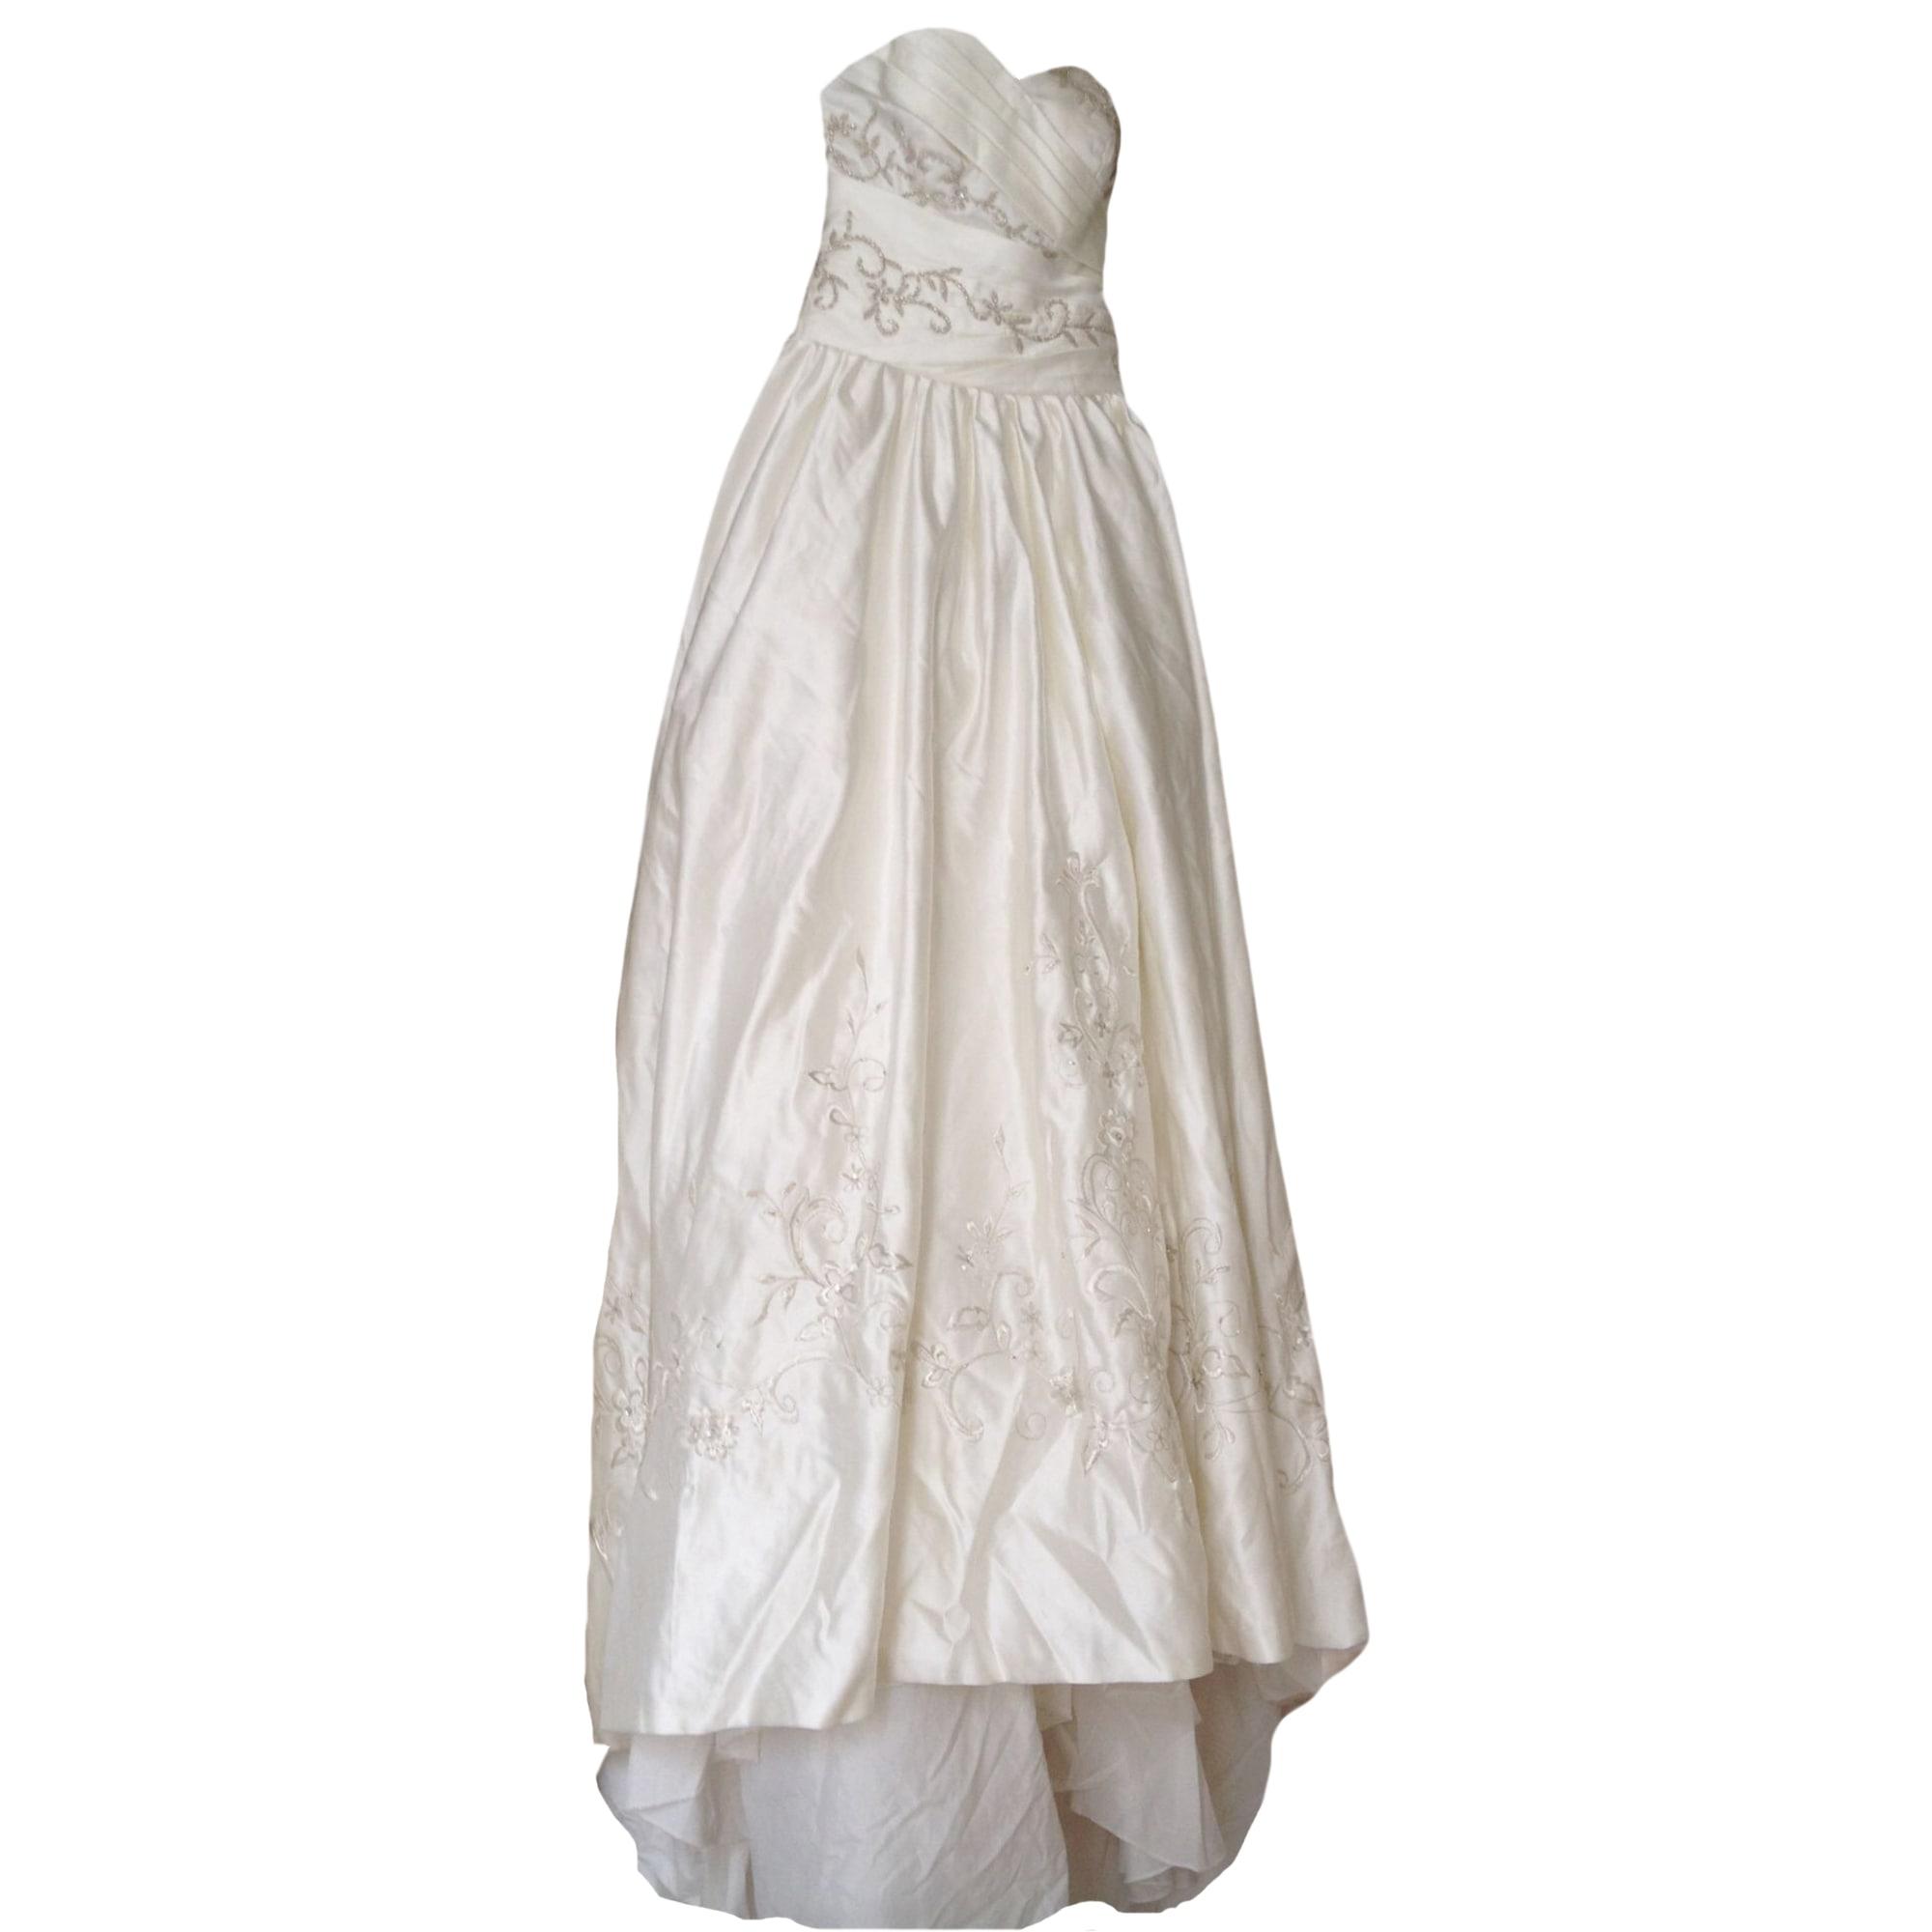 Robe de mariée QUEEN'S 19 Blanc, blanc cassé, écru